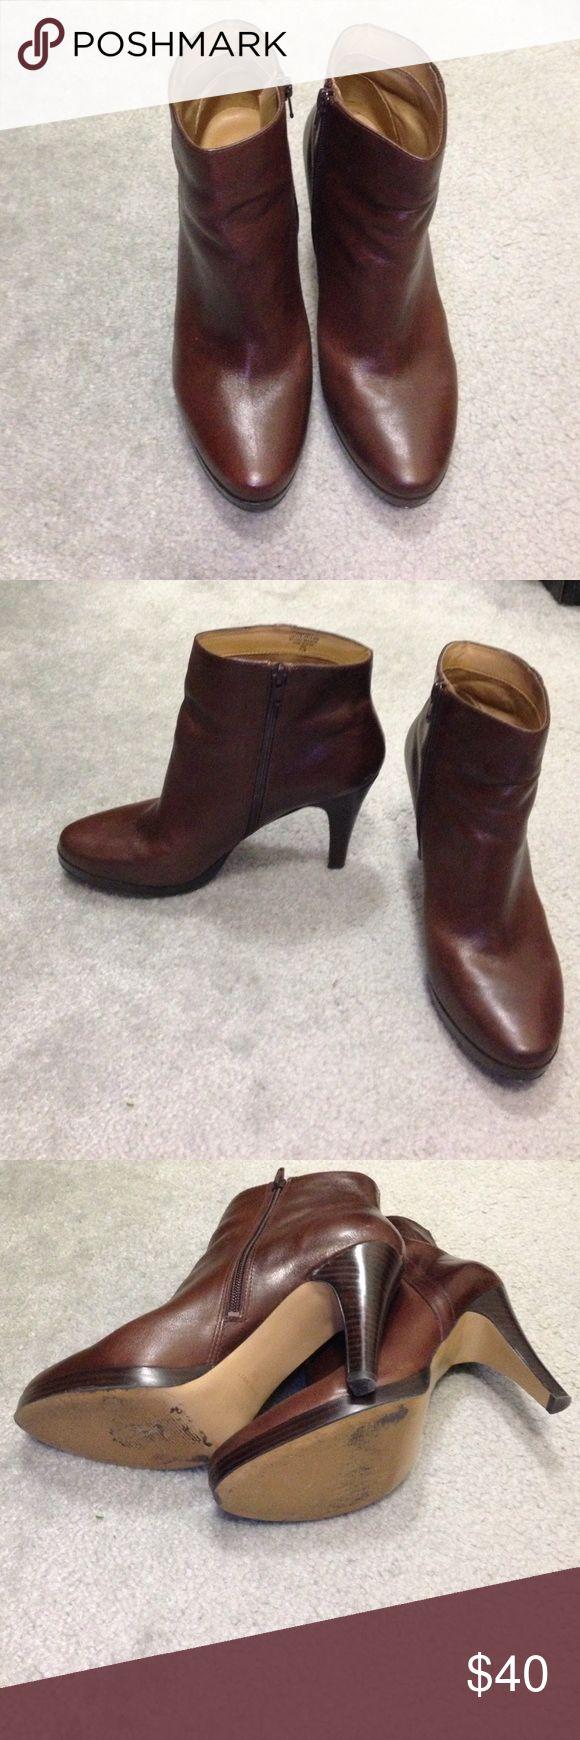 NINE WEST booties Dark brown. 4 in heel Nine West Shoes Ankle Boots & Booties